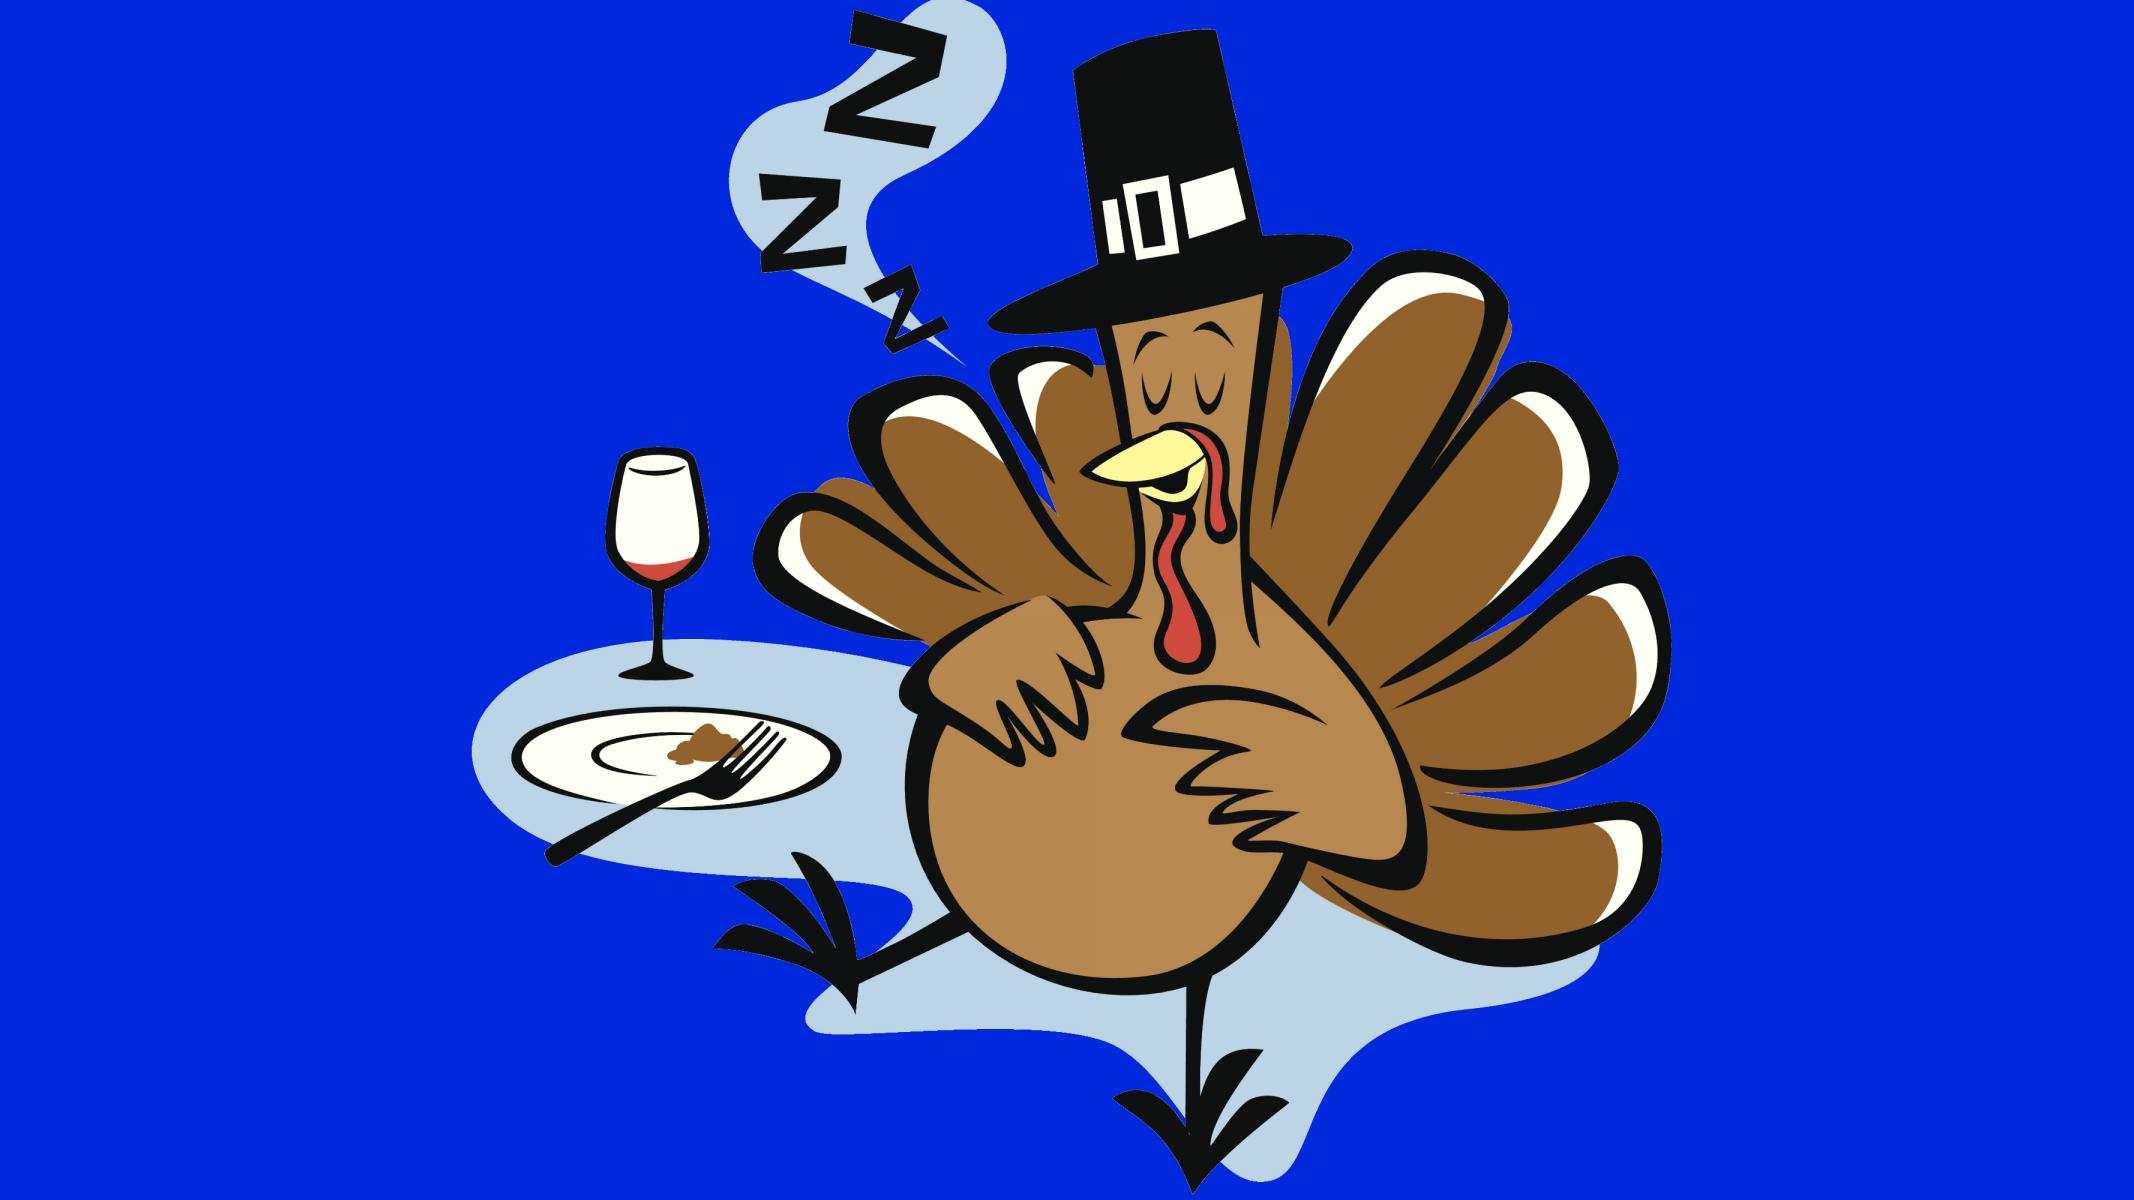 17 Thanksgiving Myths, Debunked